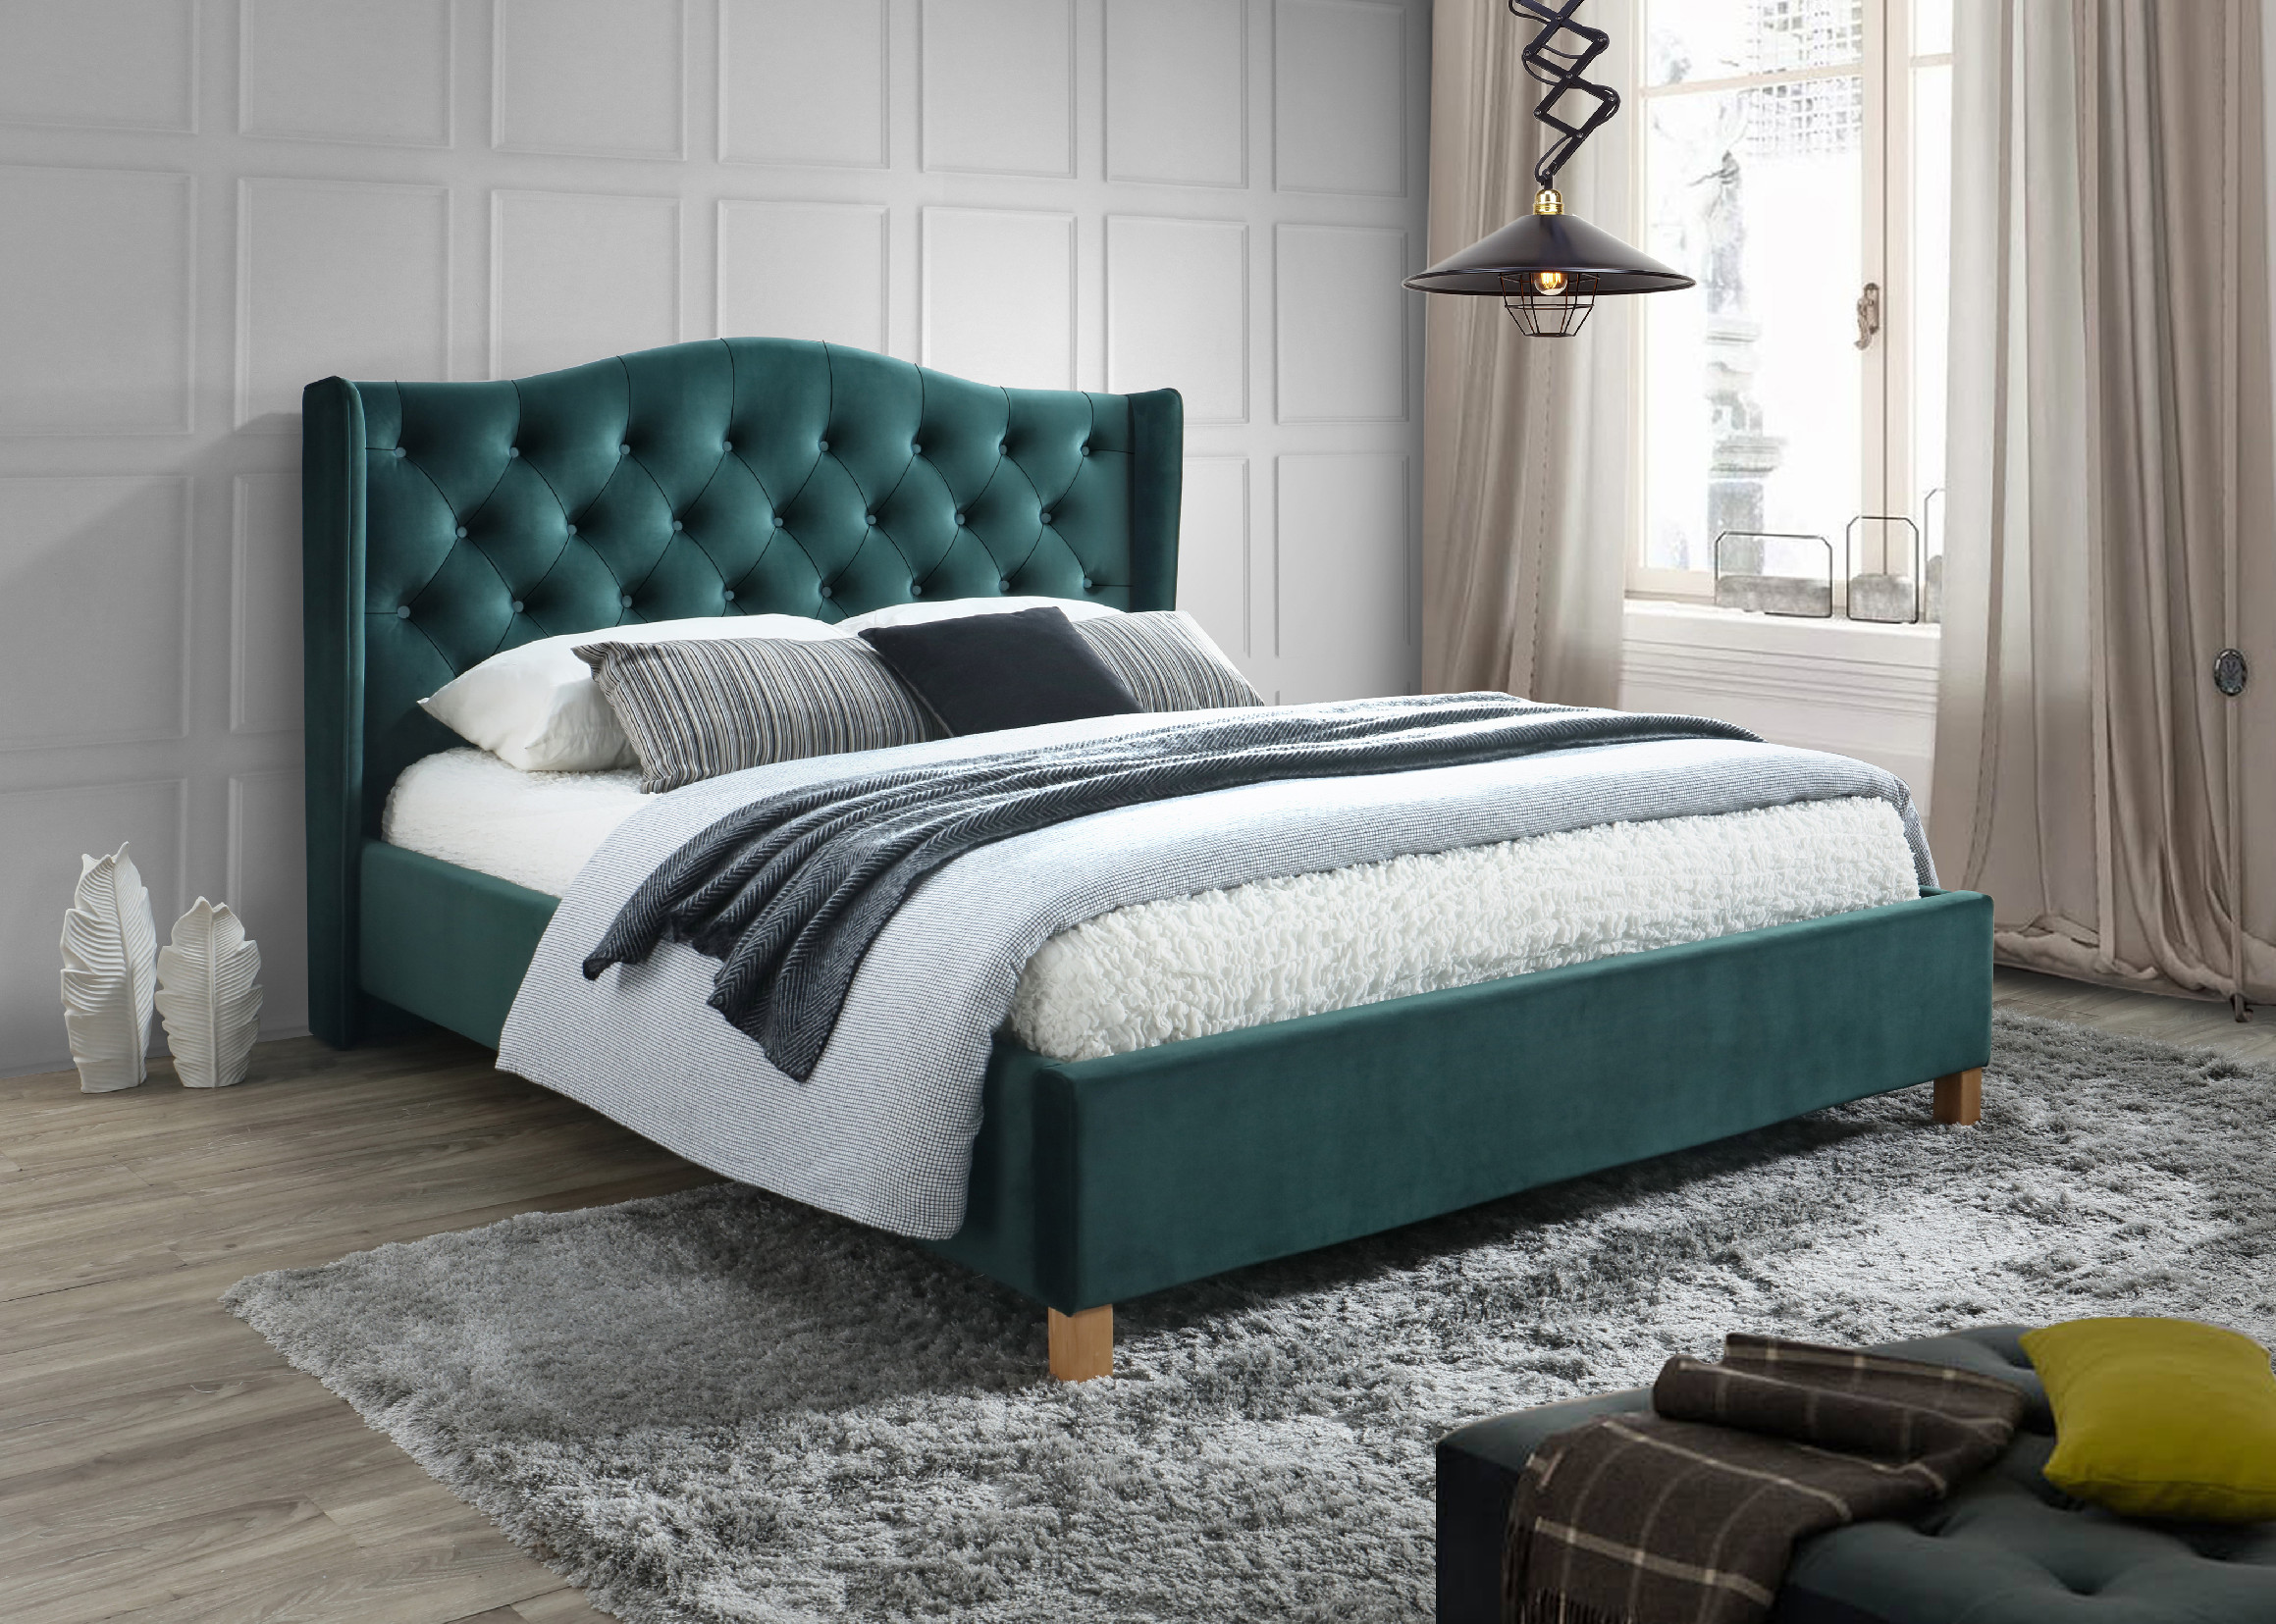 Signal Manželská posteľ Aspen Velvet 160x200 cm Farba: Zelená